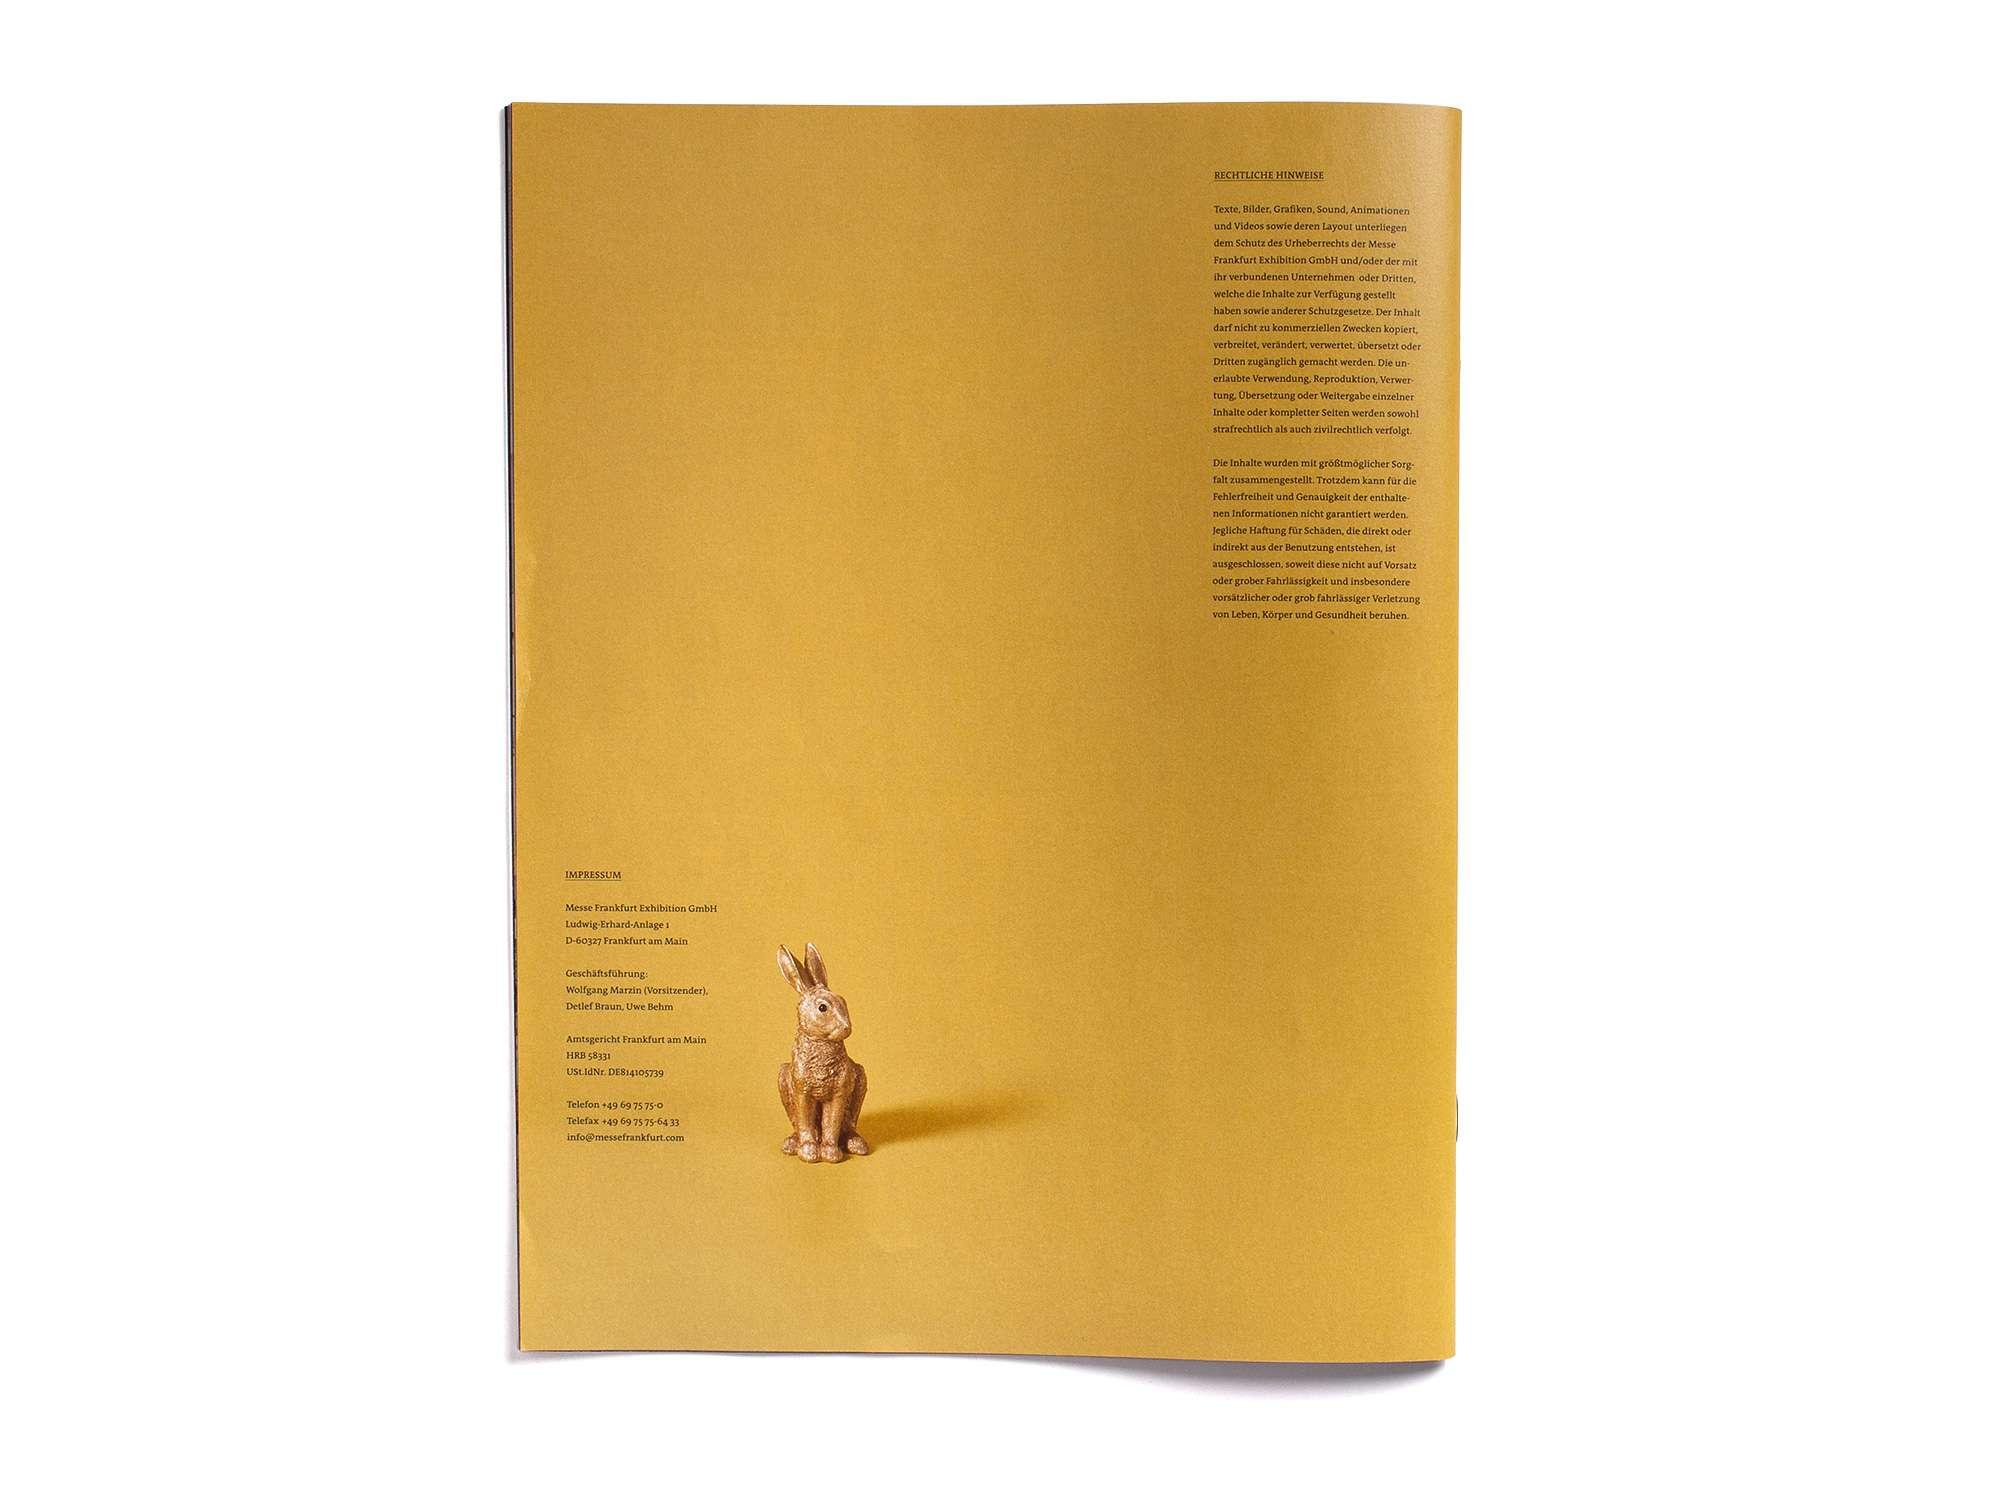 btb-tdc-magazin-12